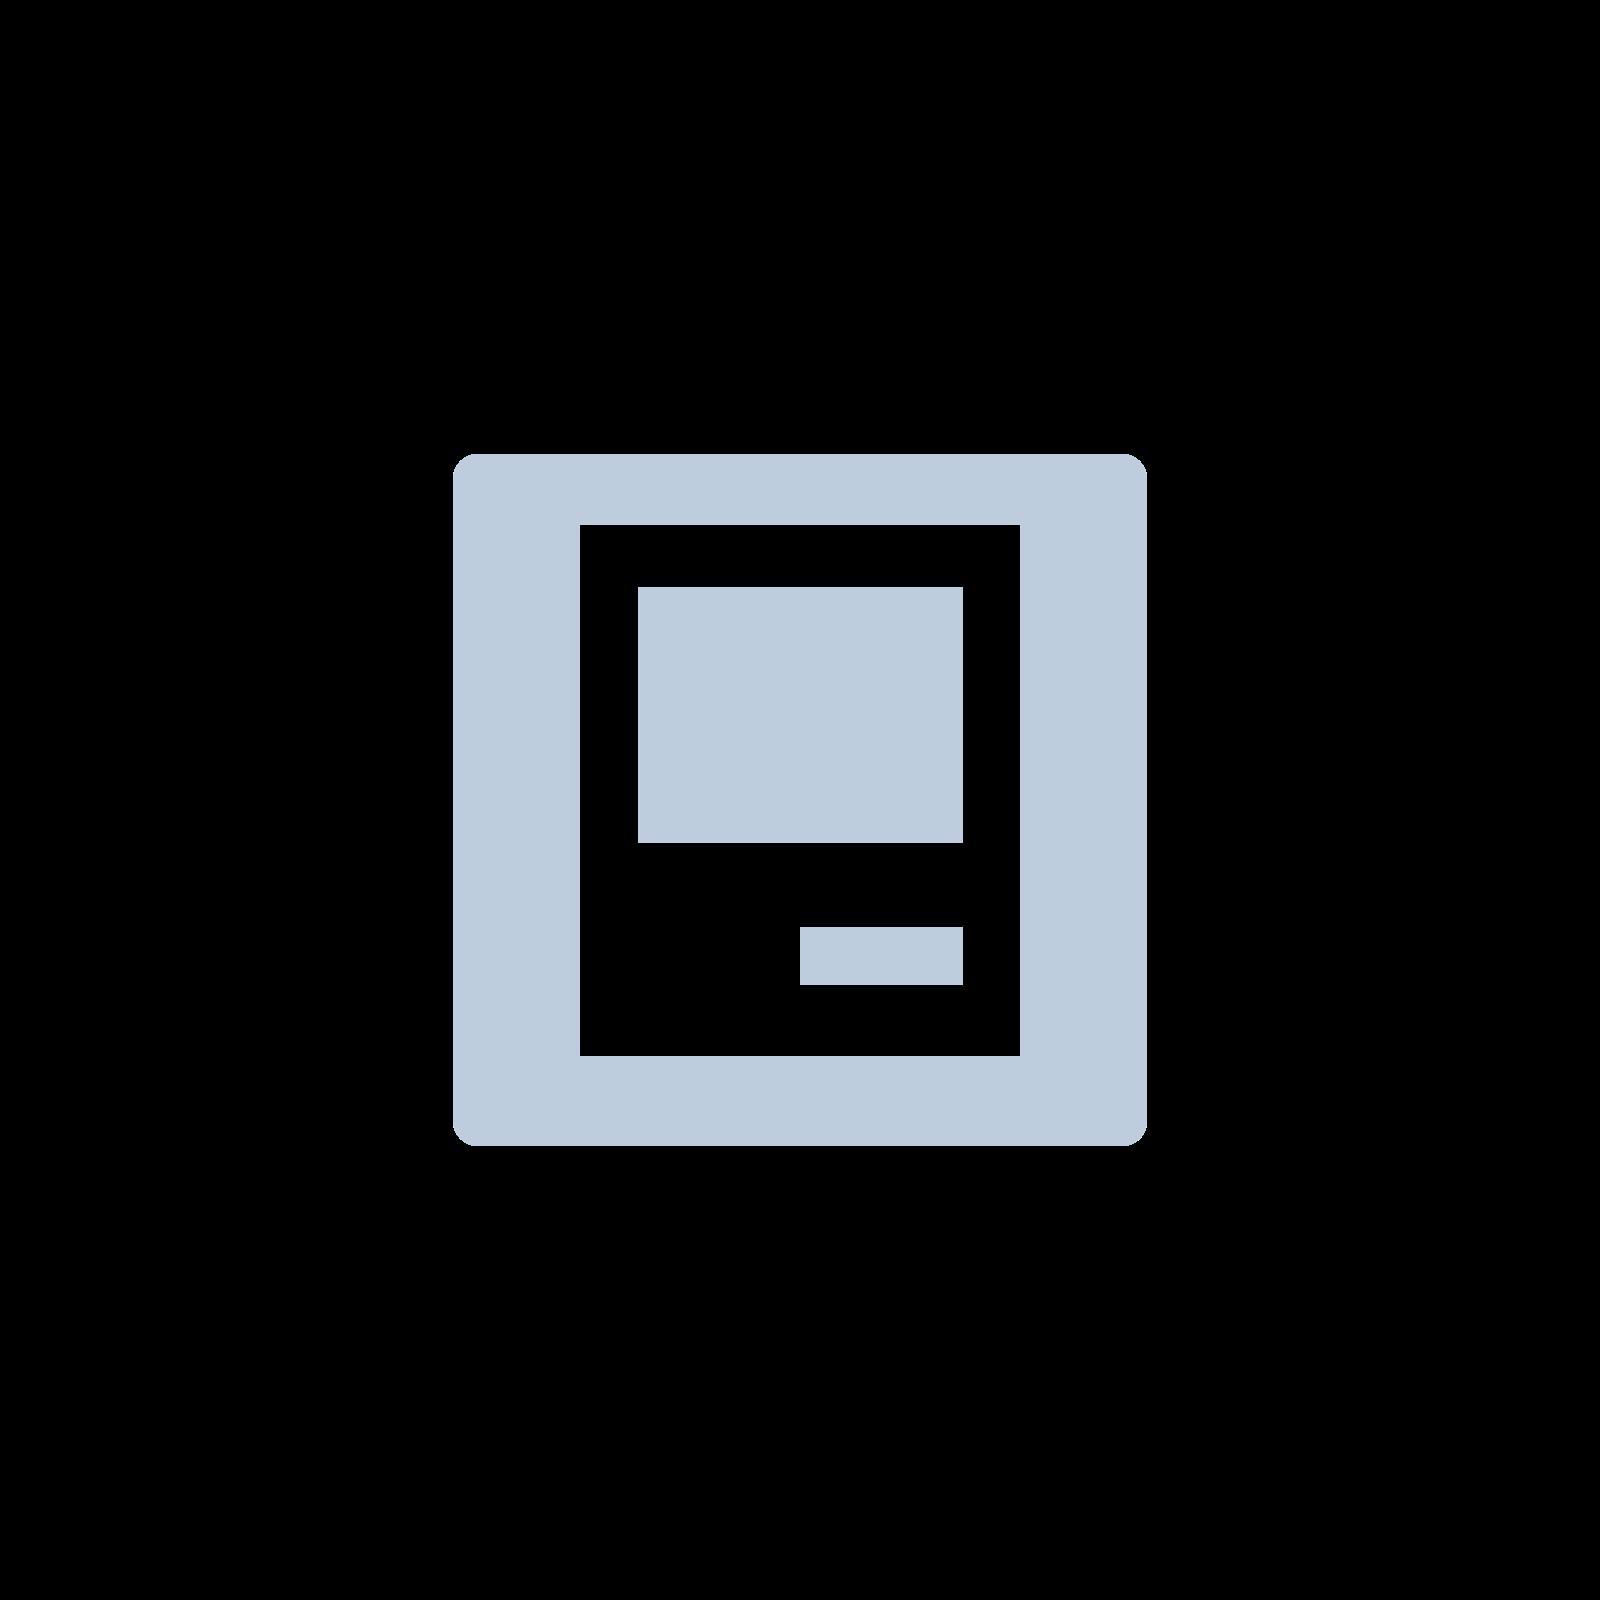 Mac mini Intel Core 2 Duo 1.83GHz (Macmini2,1)